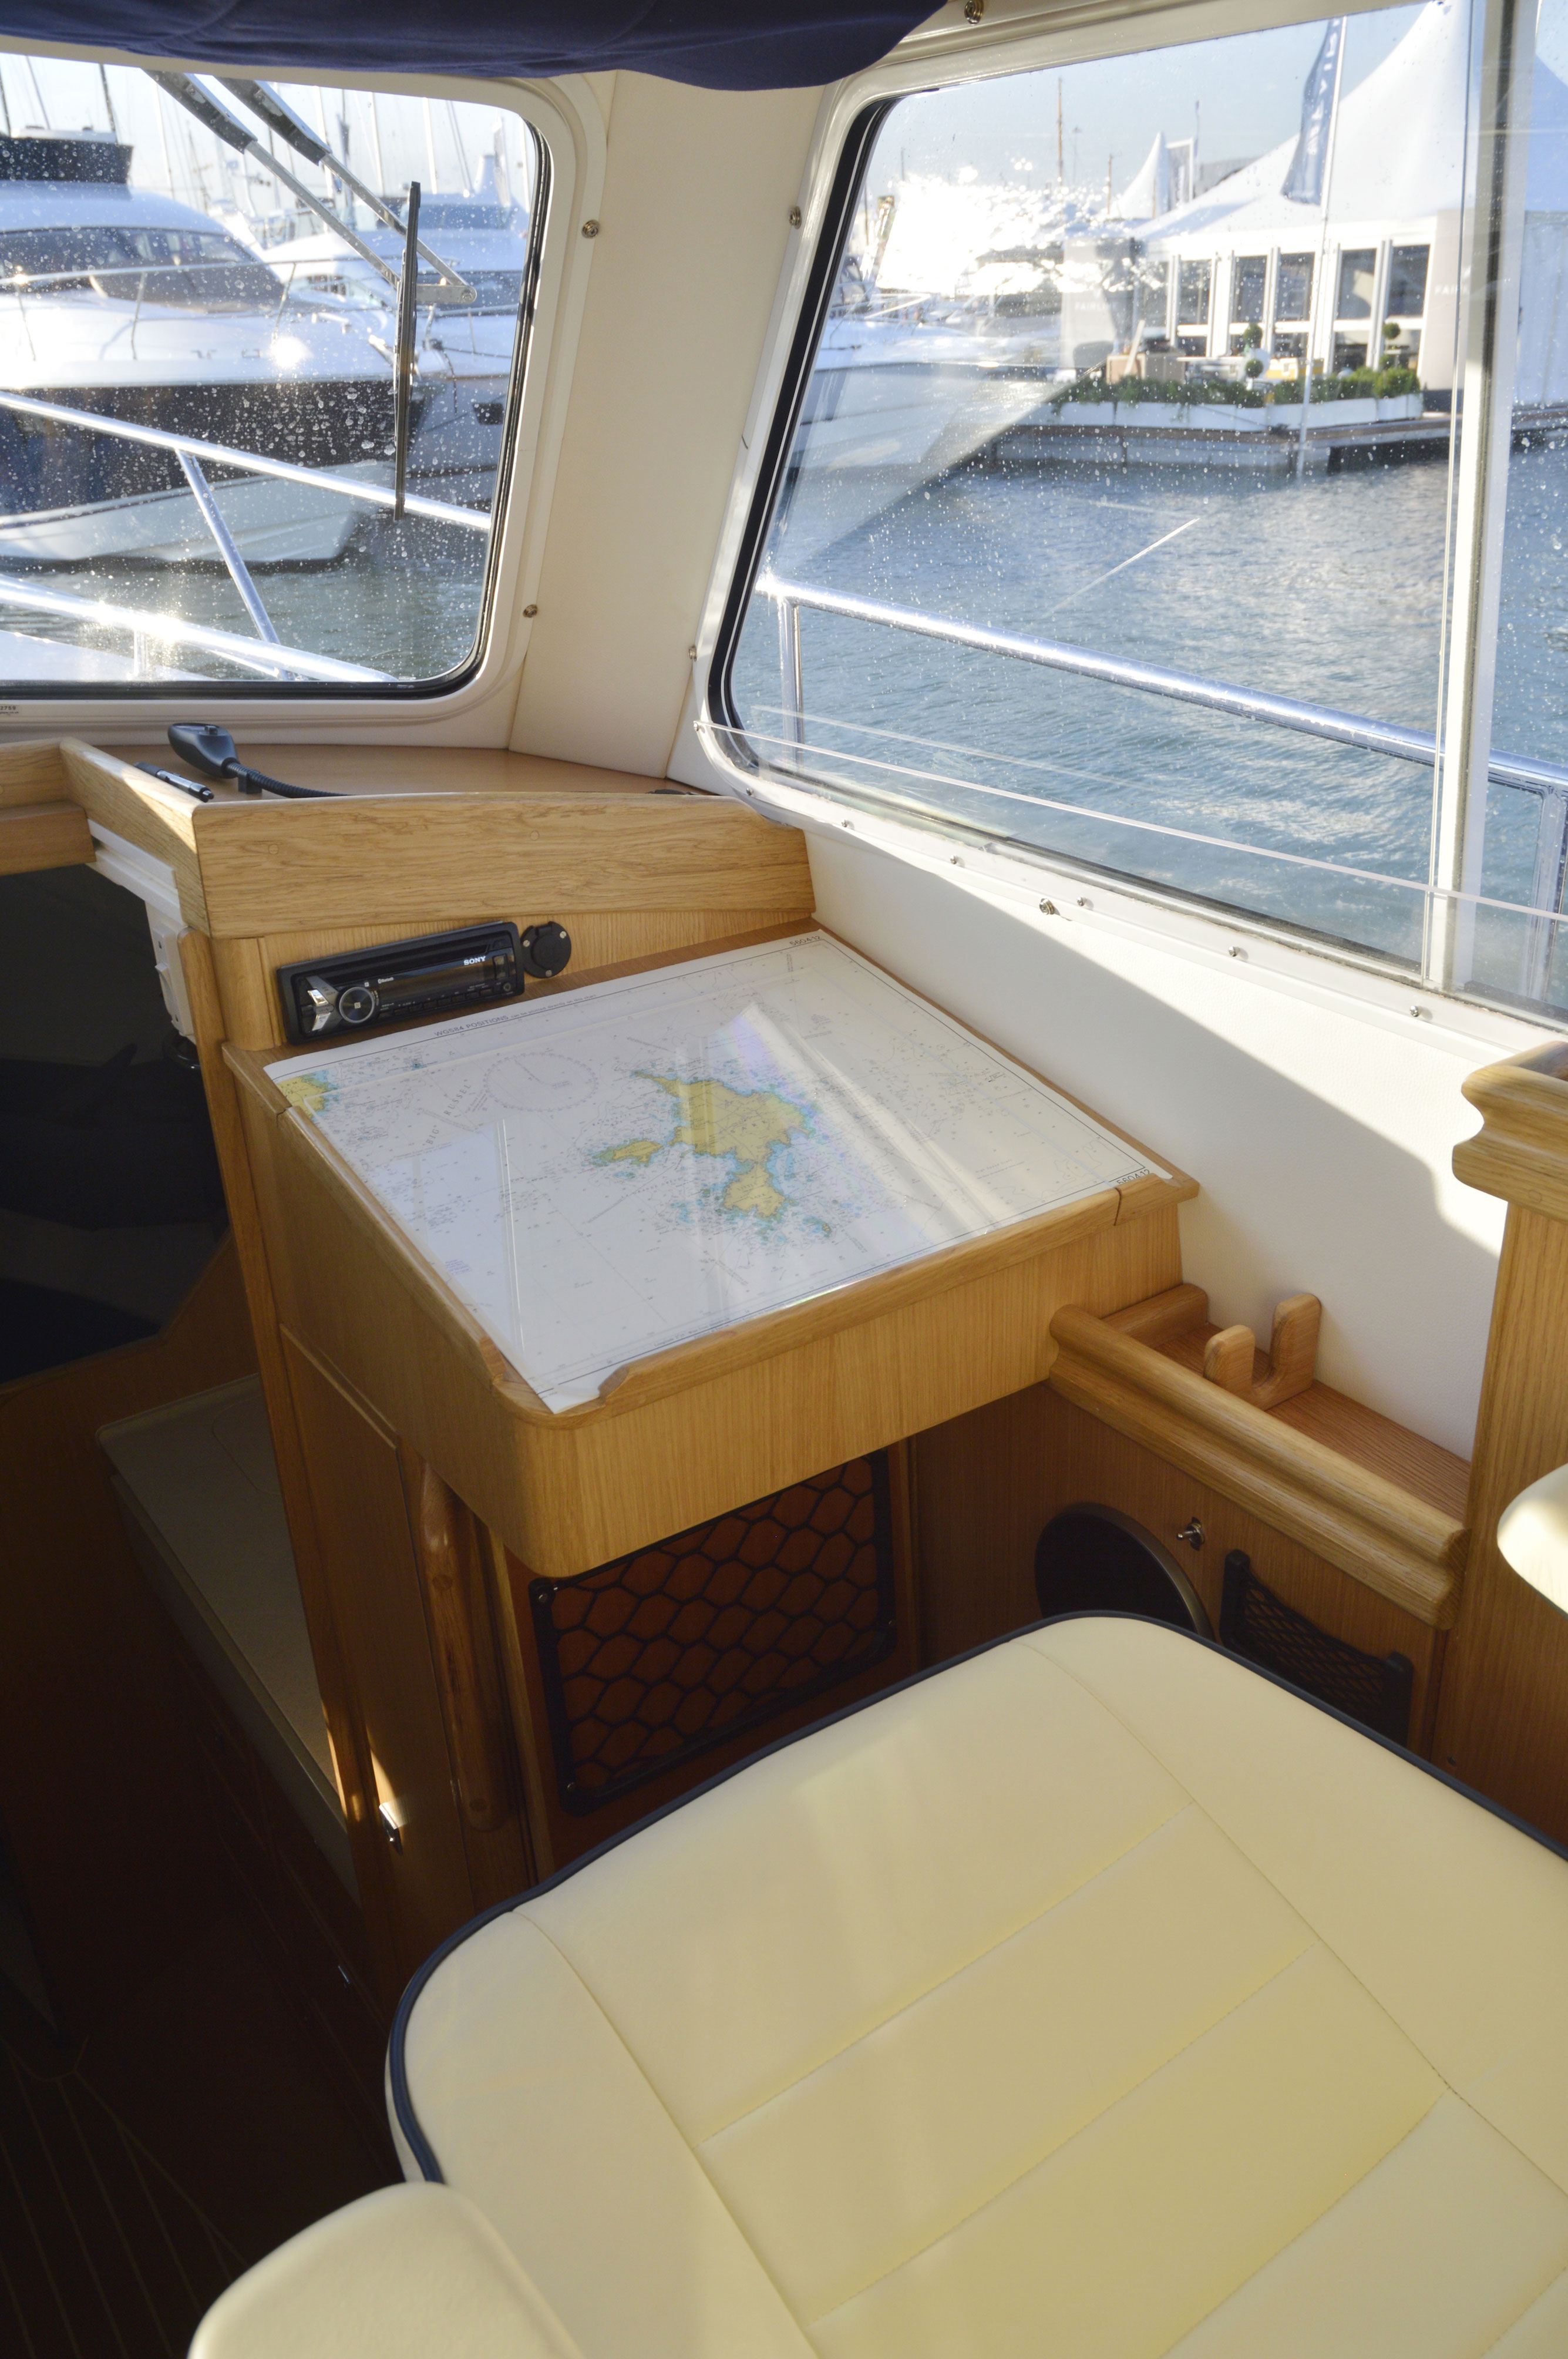 cabin cruiser dsc boats cabins vehicle service feadship devea classic tourboat boat